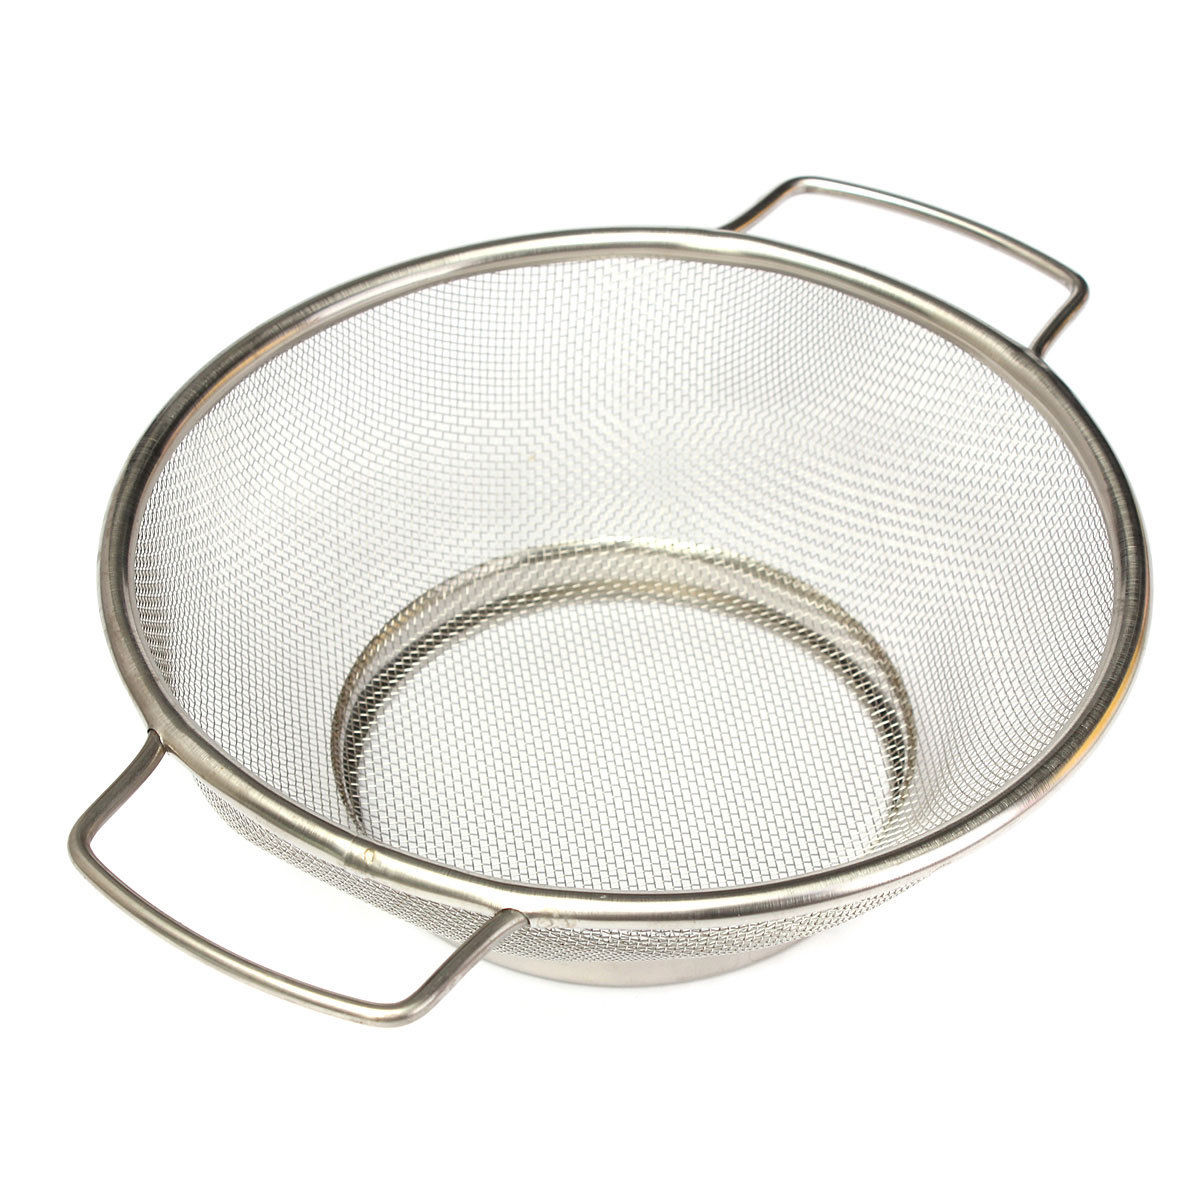 HOT SALE Stainless Steel Fine Mesh Strainer Bowl Drainer Vegetable Sieve Colander Sifter